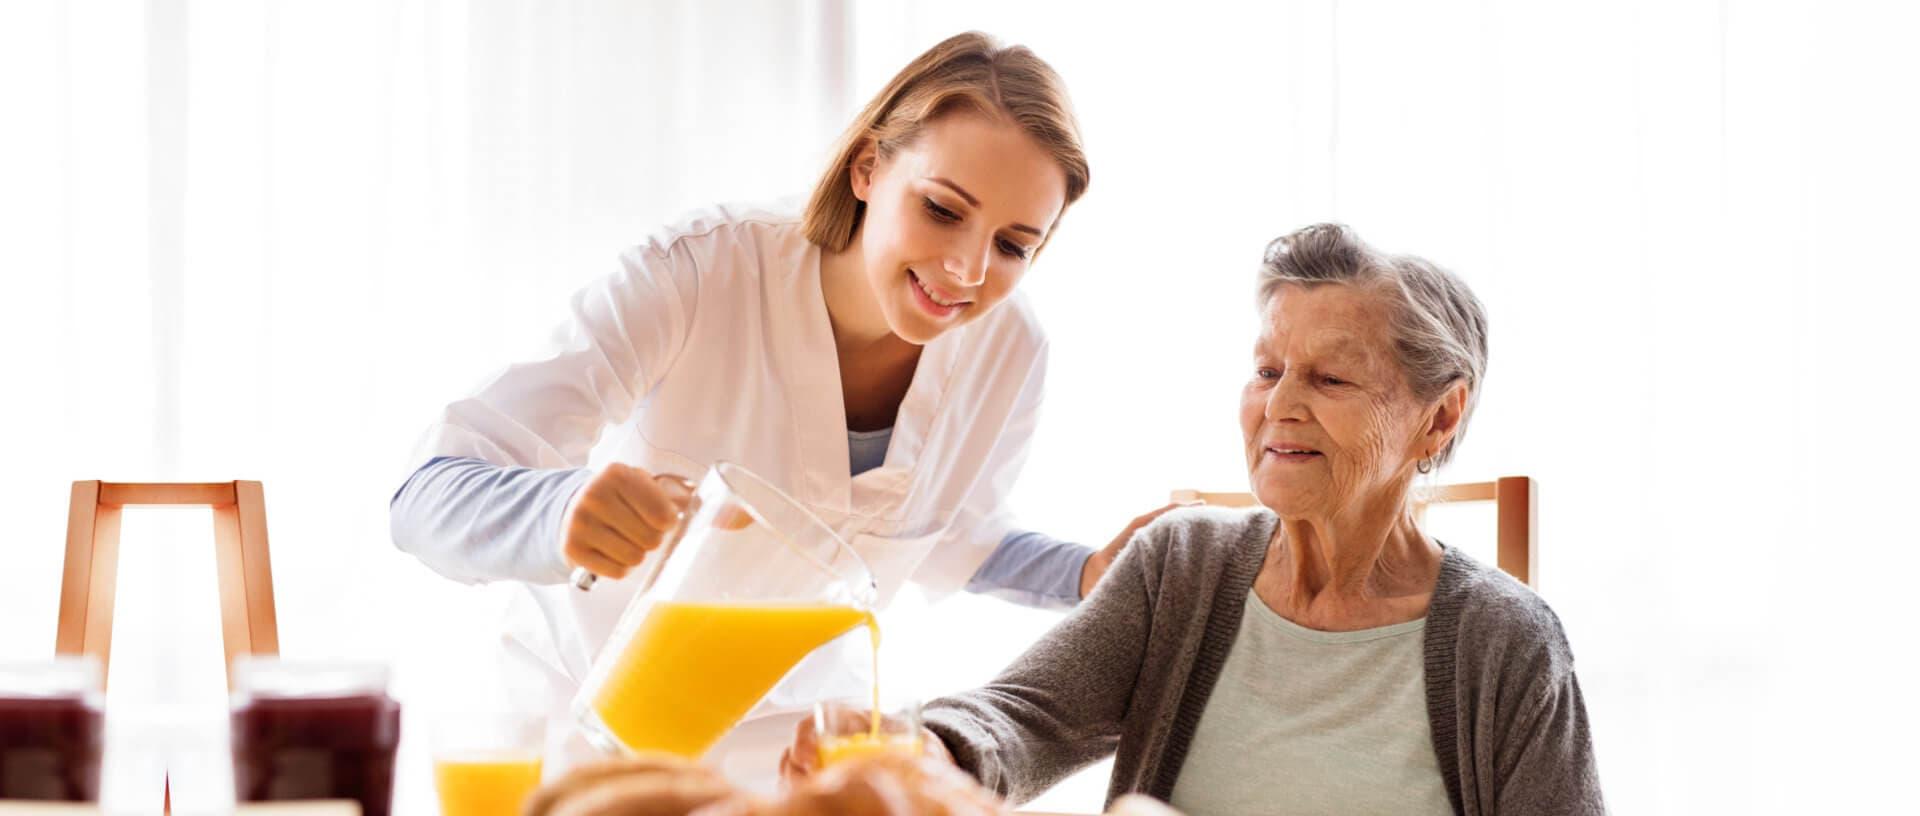 caregiver serving a juice to senior woman